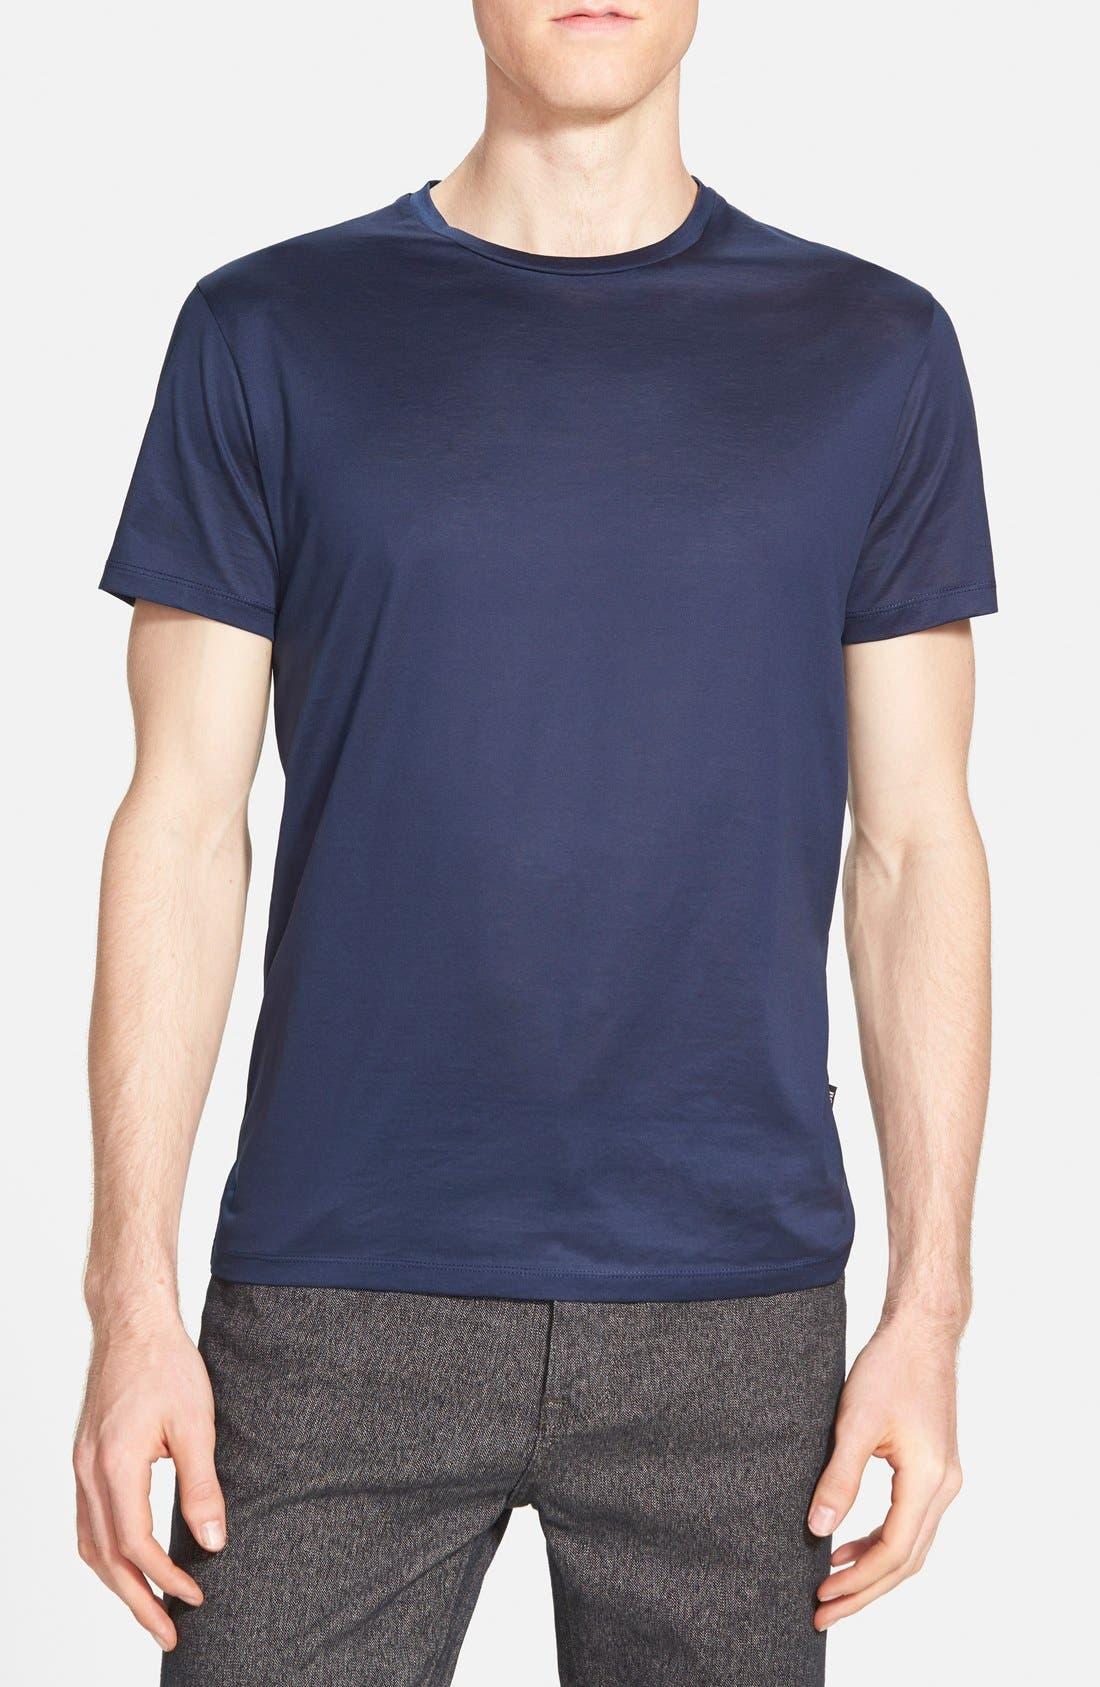 Main Image - BOSS HUGO BOSS 'Lecco' T-Shirt